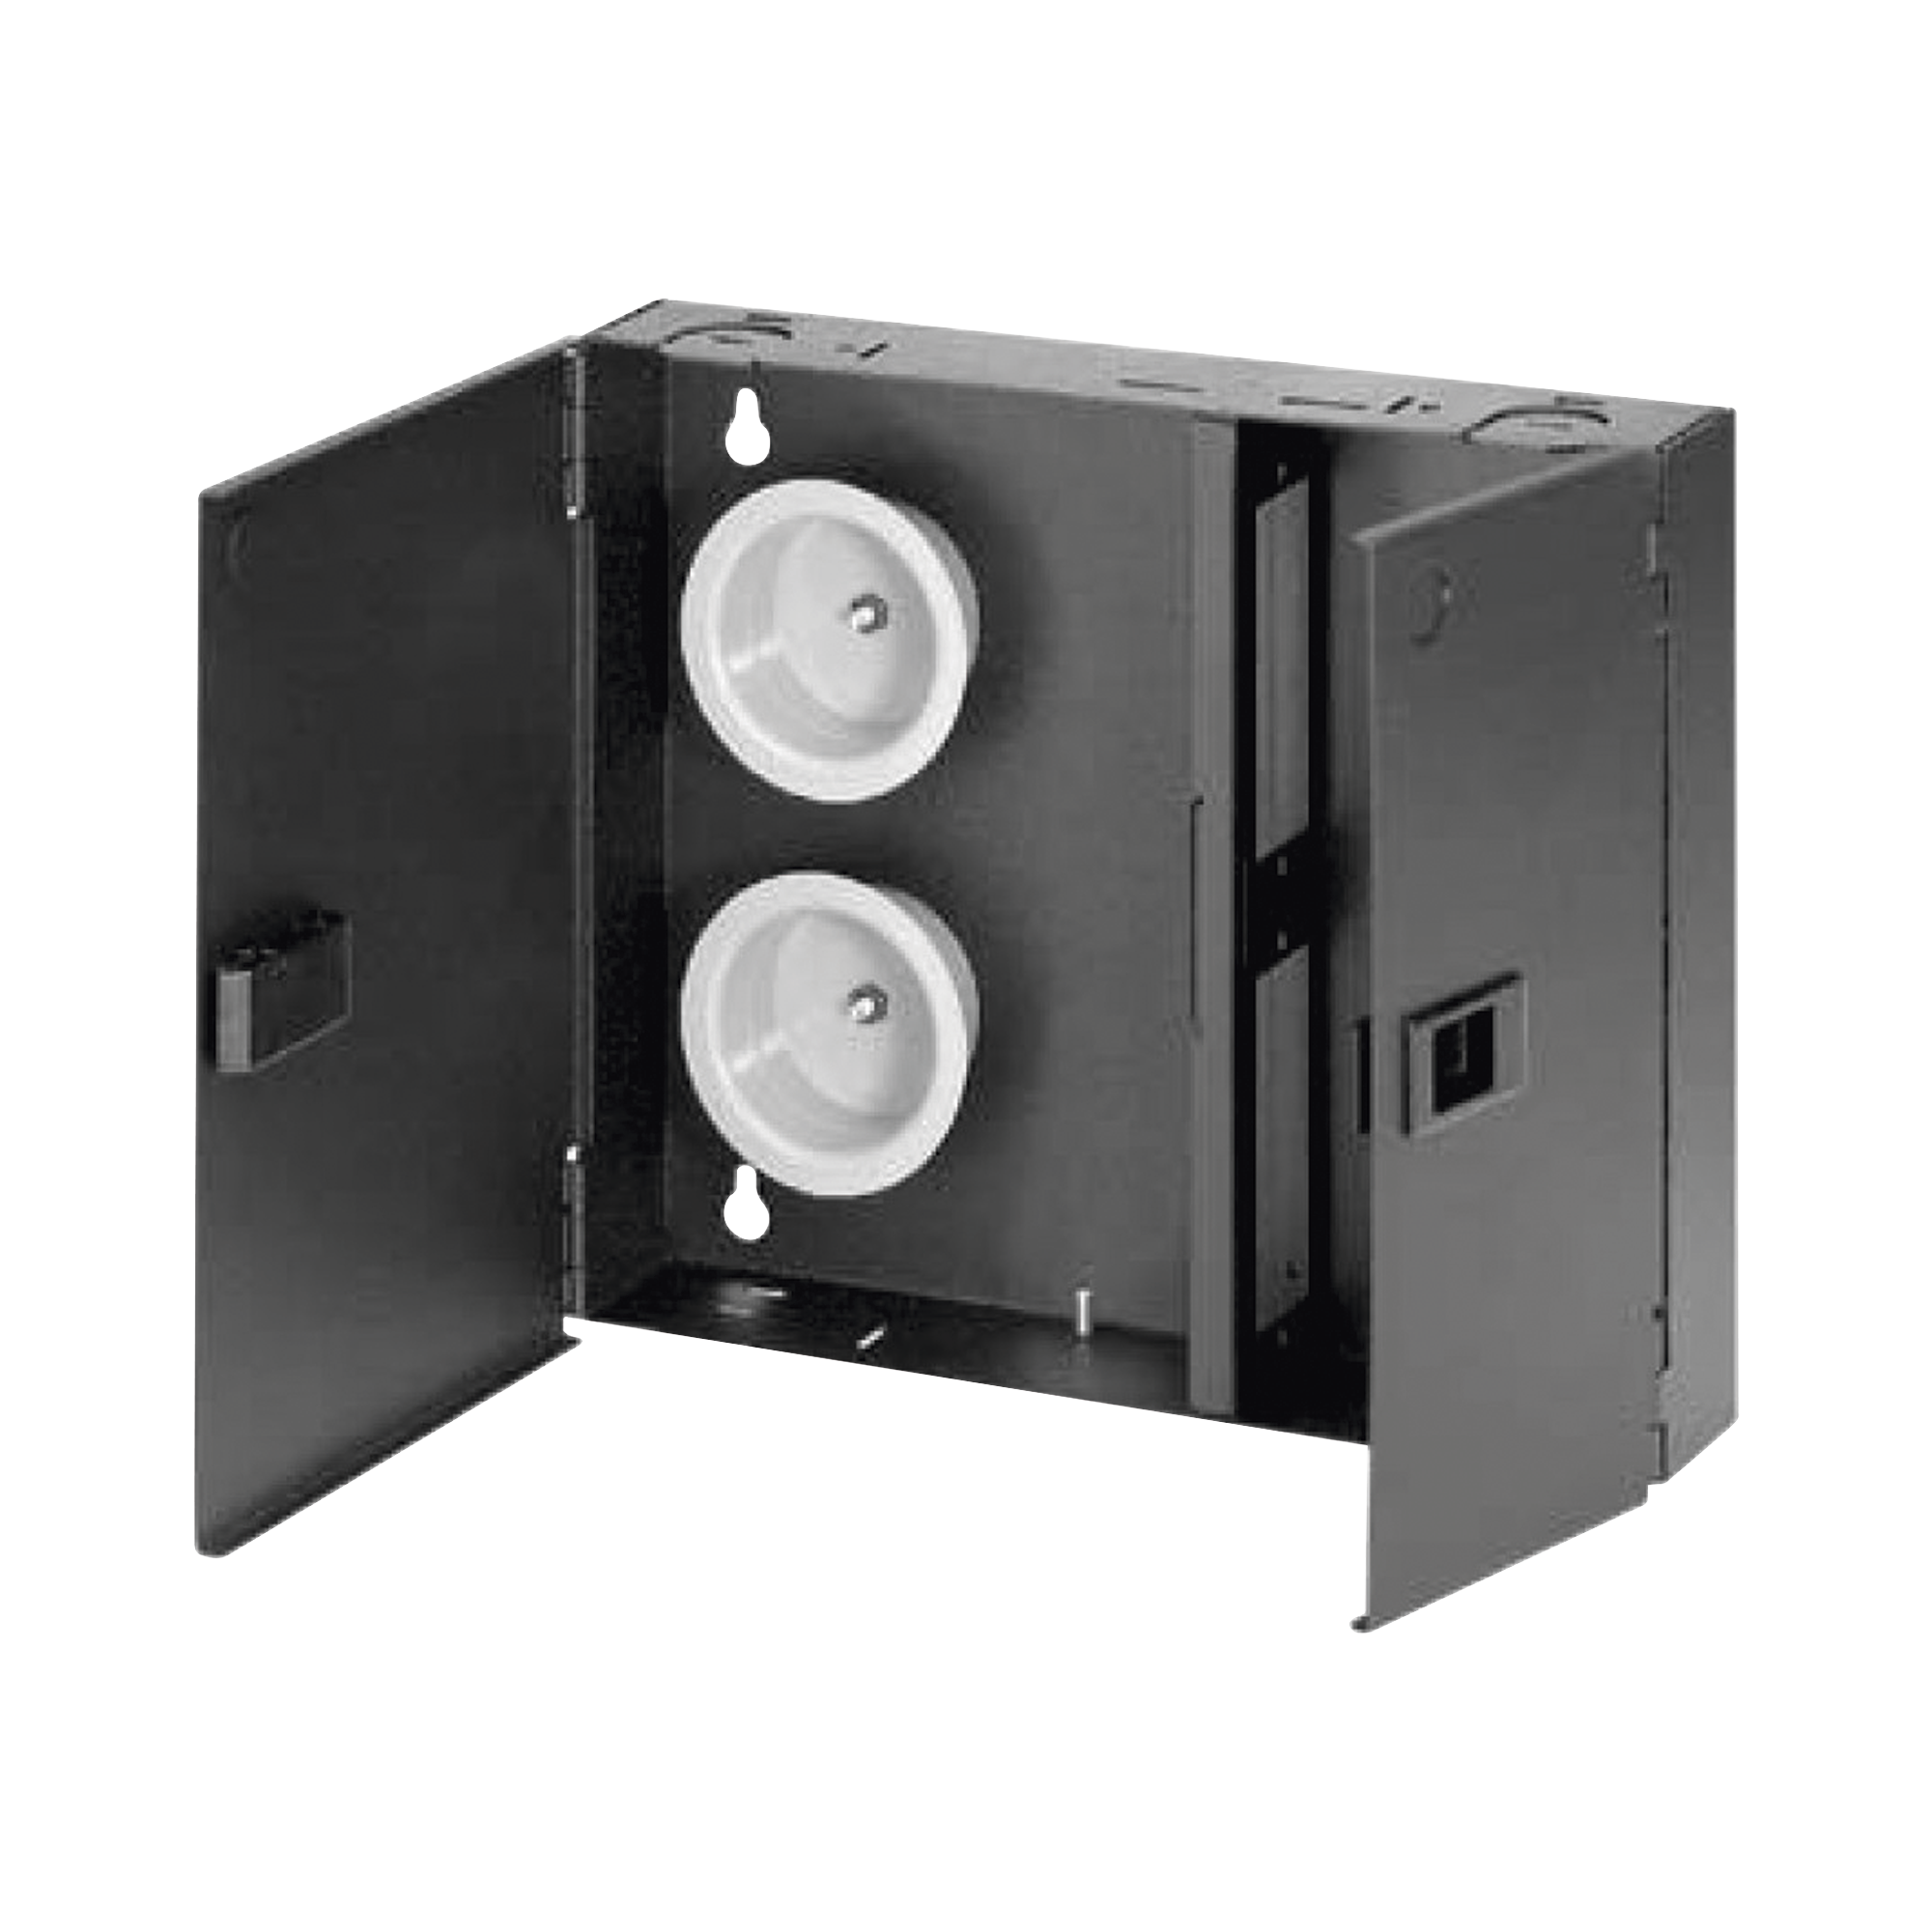 Caja de Conexión de Fibra óptica, Para Montaje en Pared, Acepta 2 Placas FAP o FMP, Hasta 48 Fibras, Color Negro